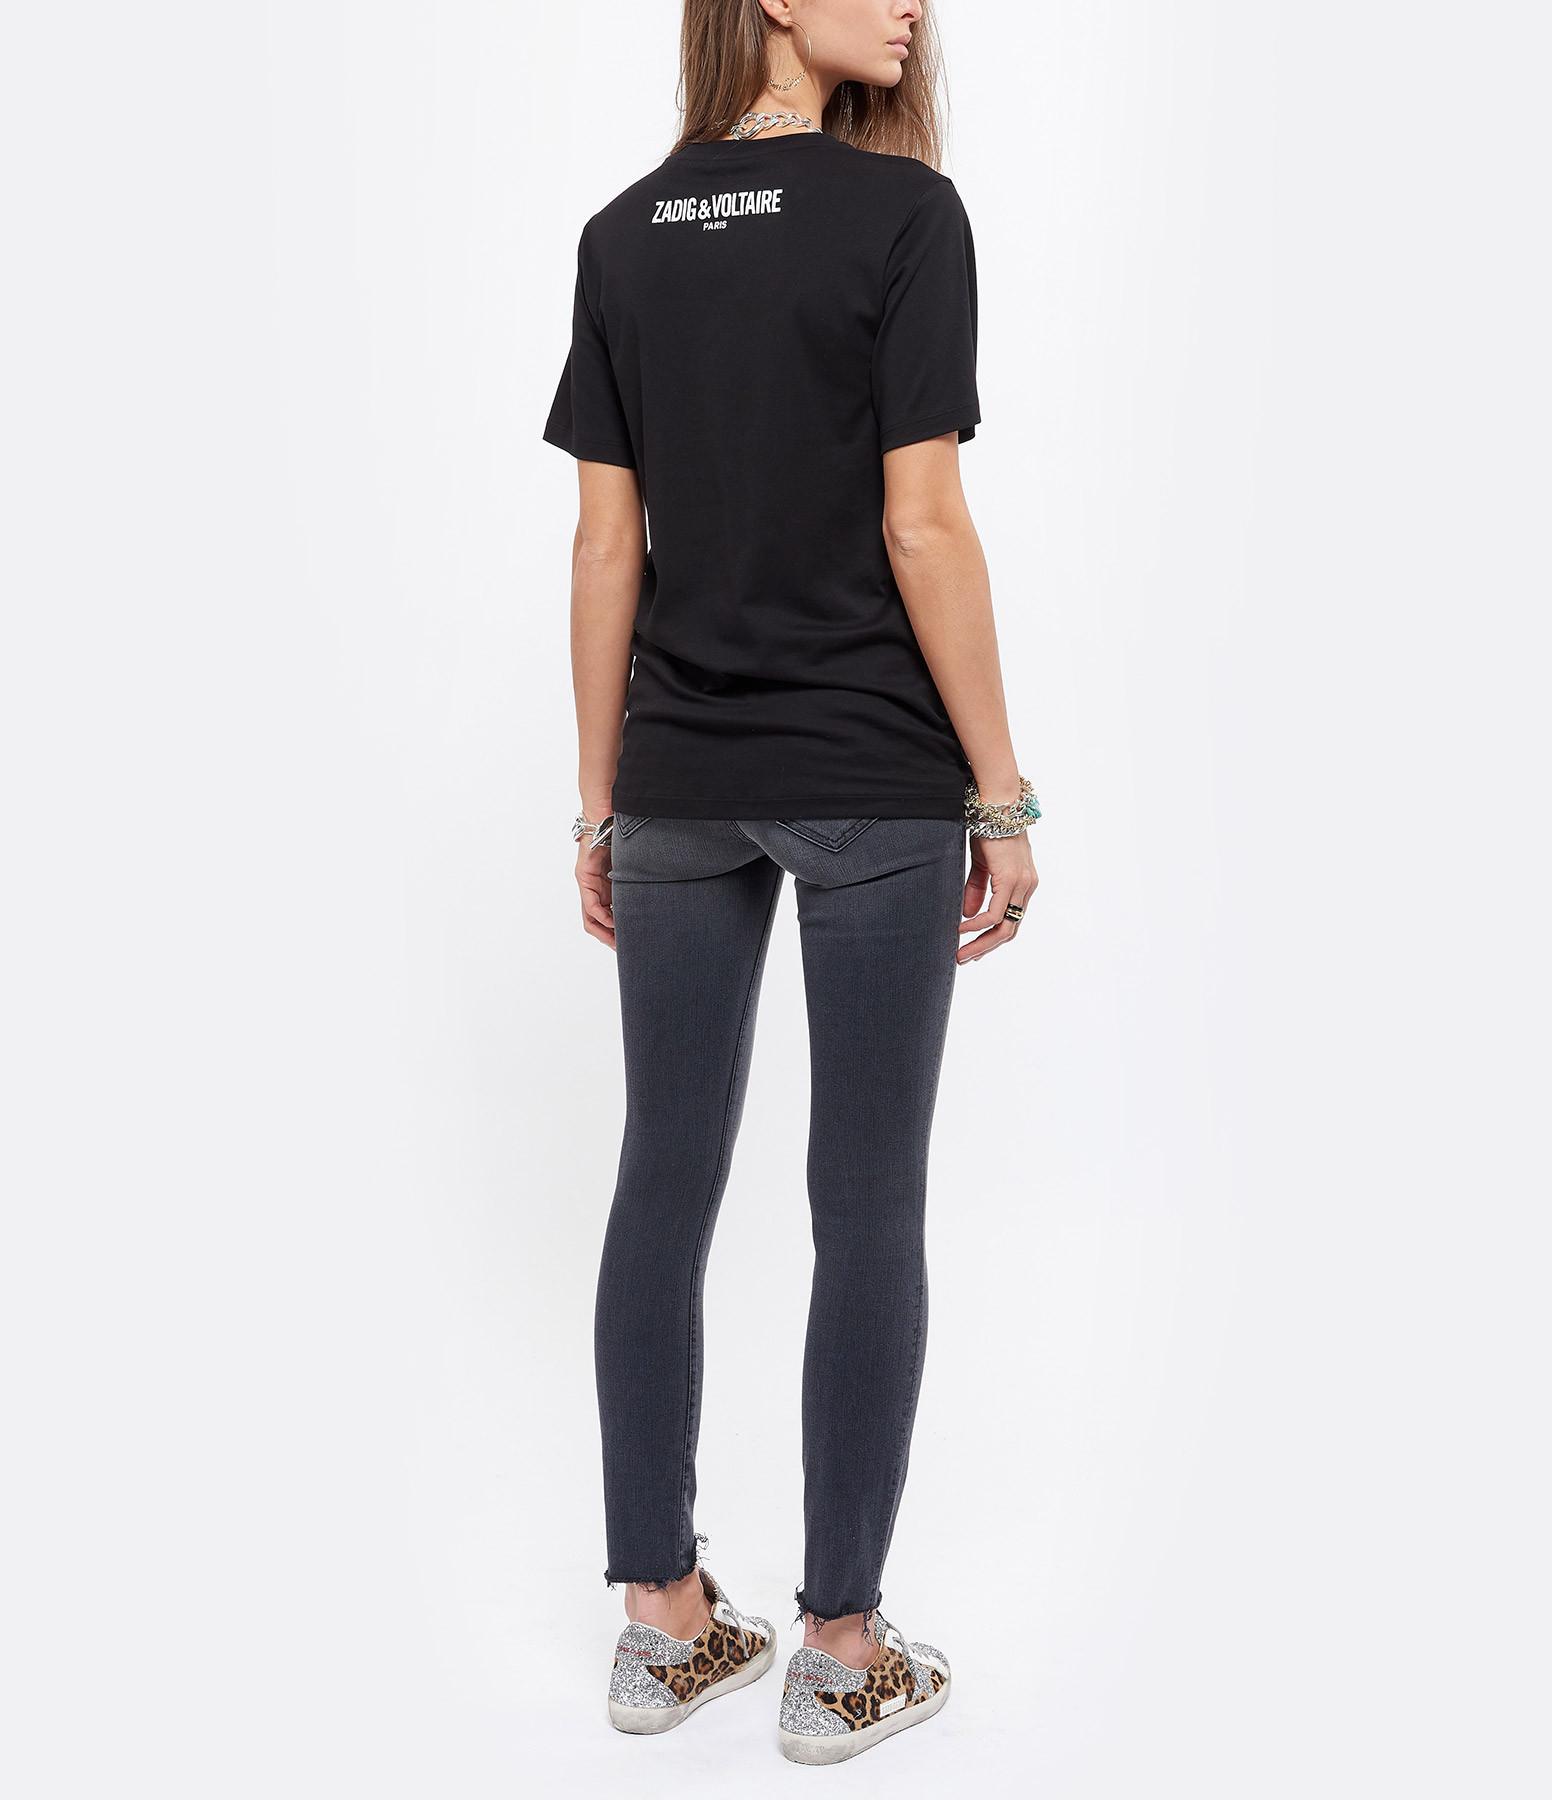 ZADIG & VOLTAIRE - Tee-shirt Bella Coton Noir